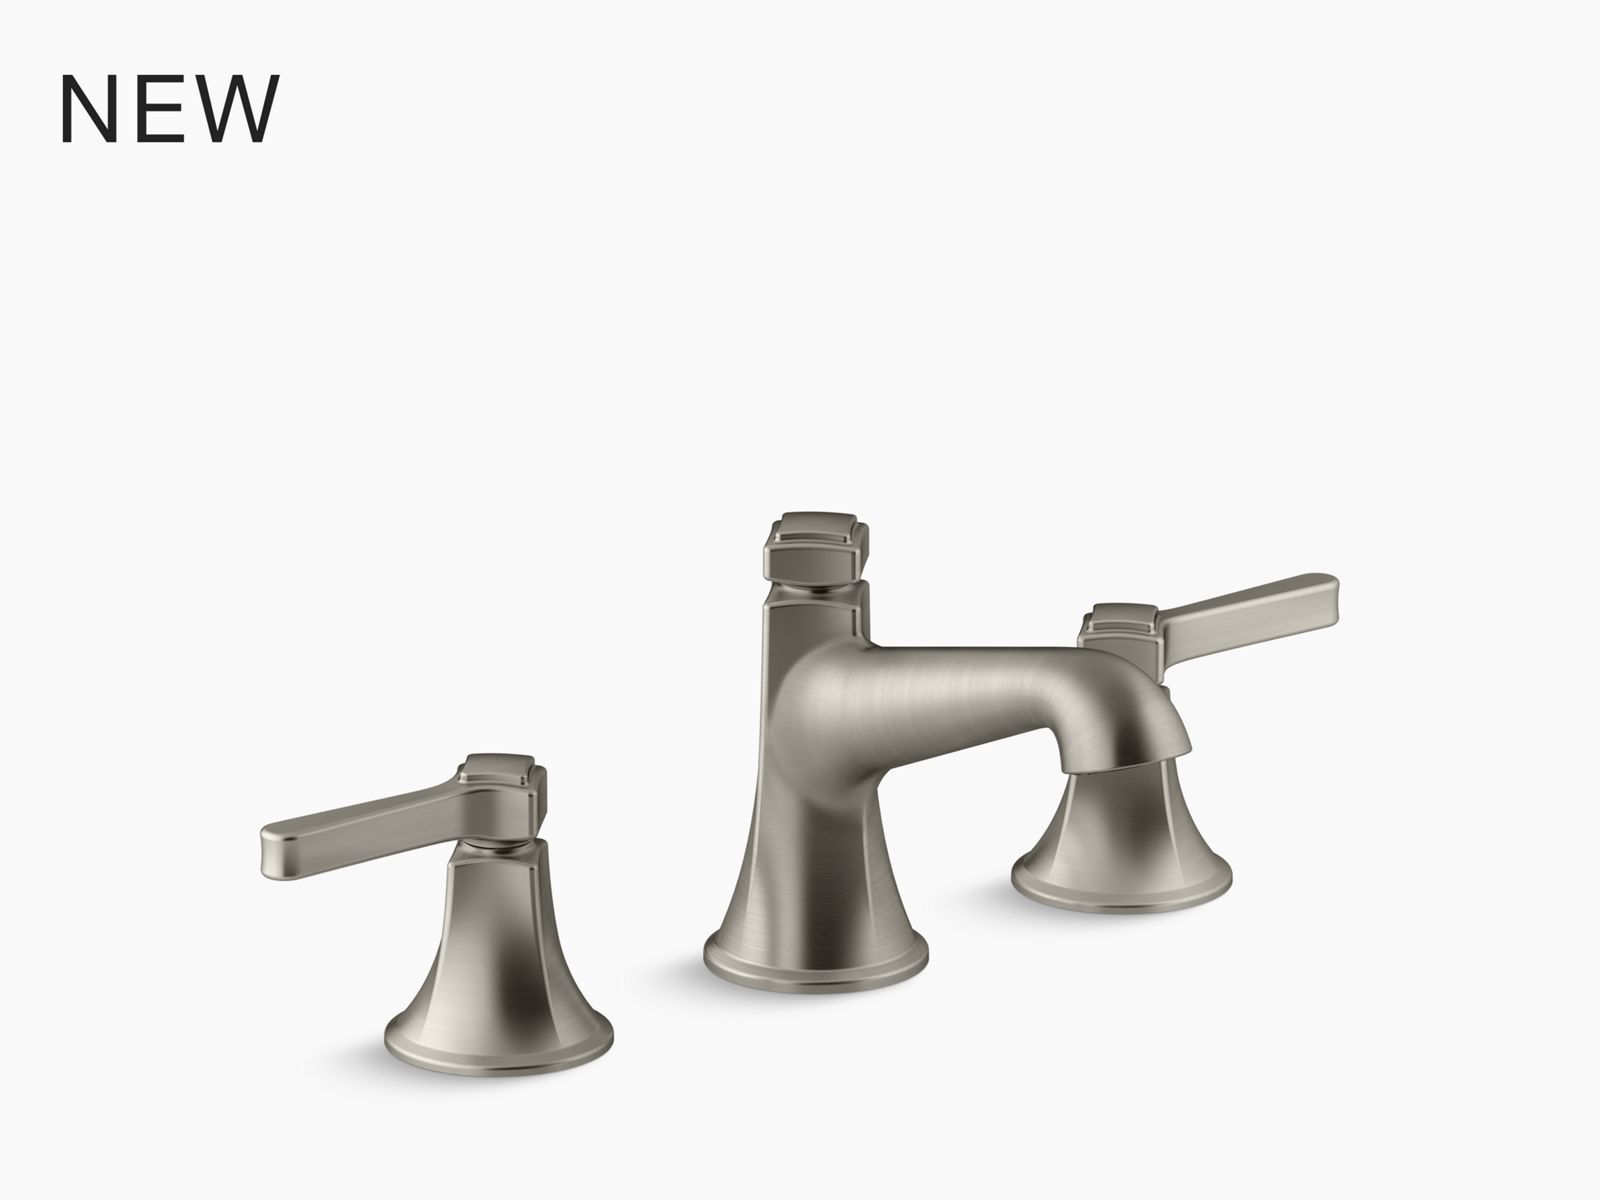 strive 35 1 2 x 21 1 4 x 9 5 16 undermount single bowl farmhouse kitchen sink